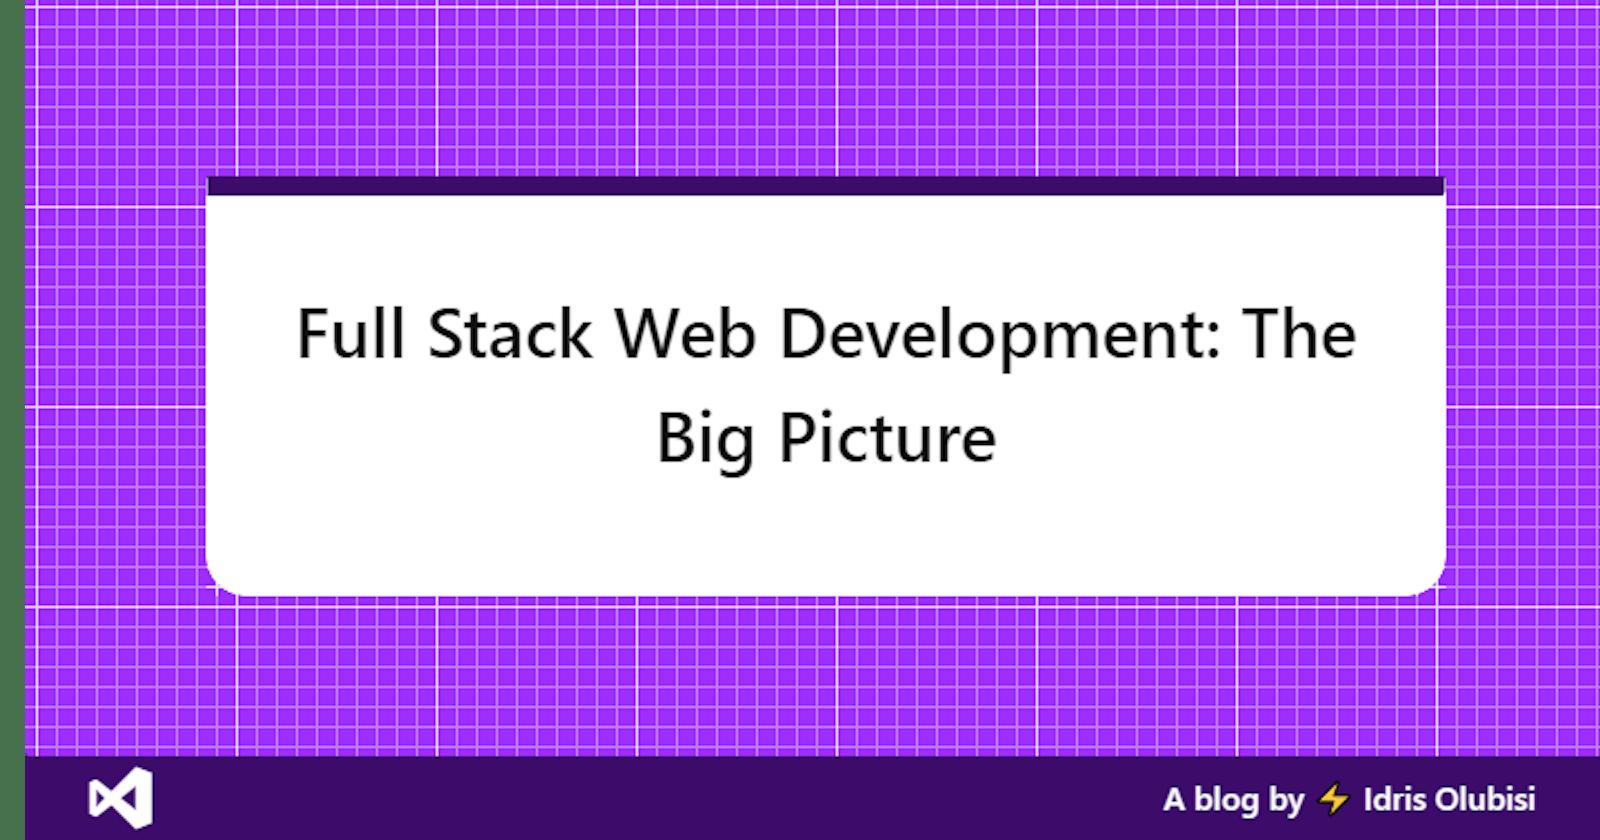 Full Stack Web Development: The Big Picture